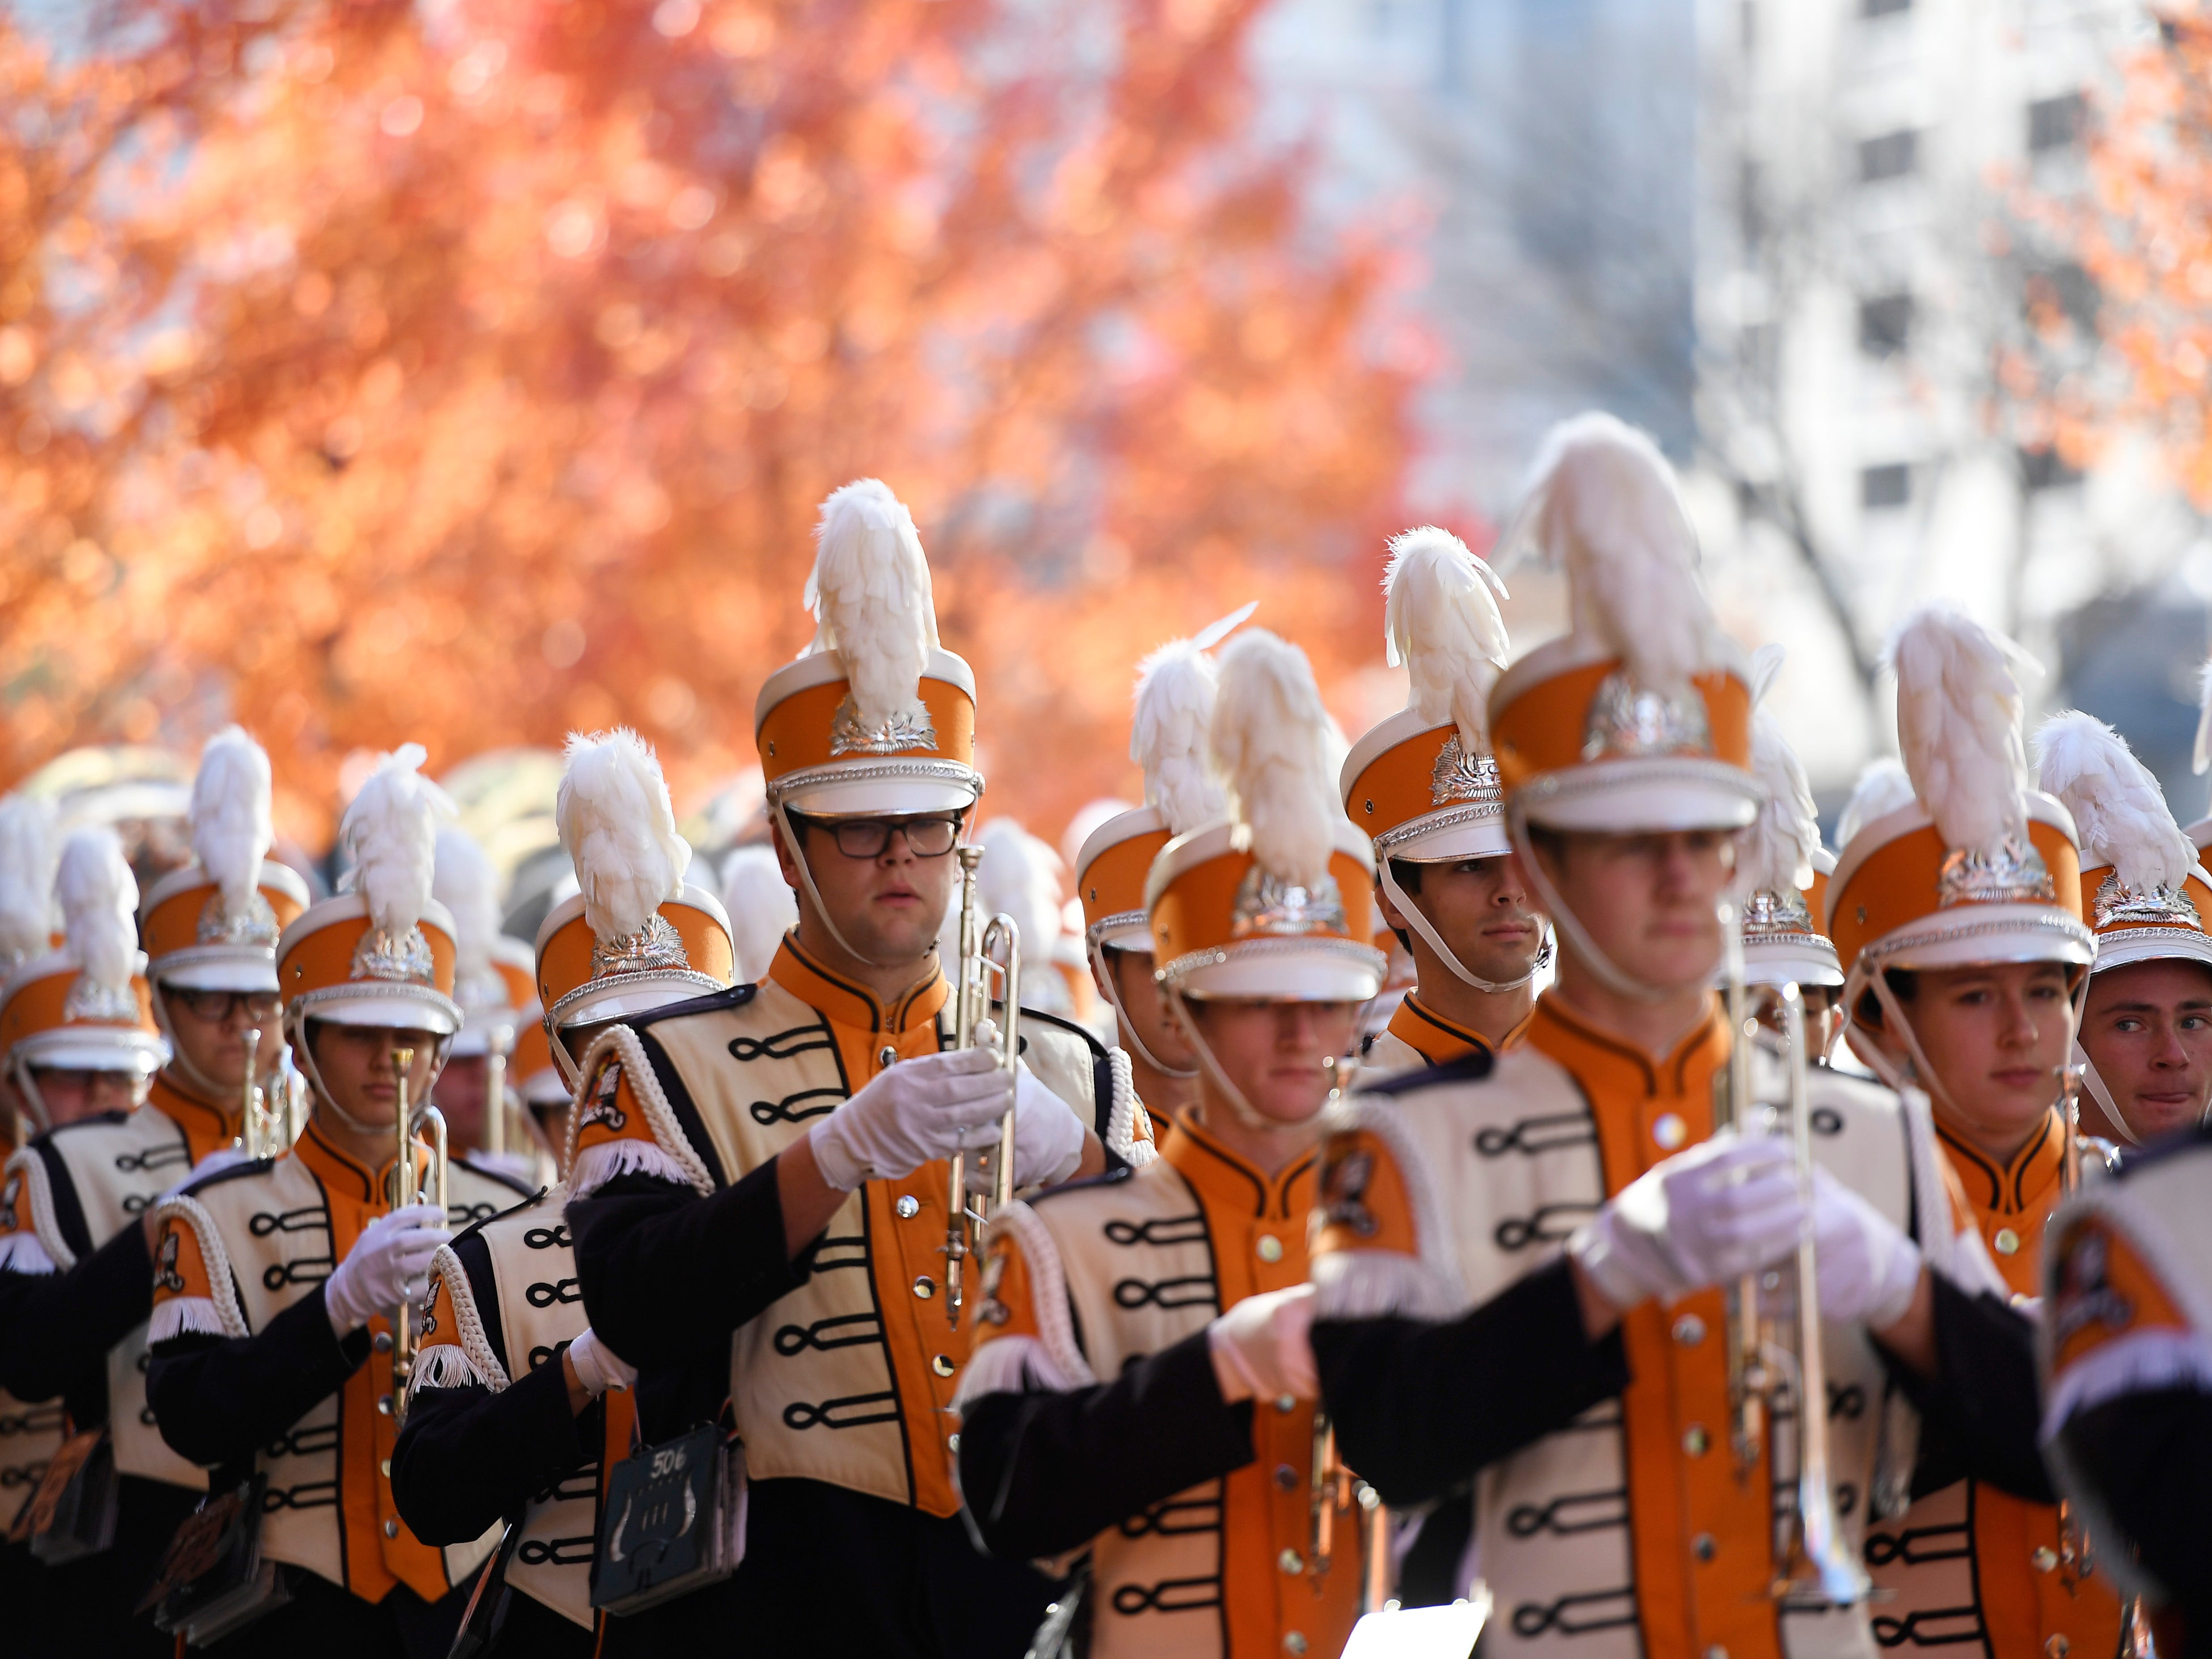 The Tennessee band arrives before the game at Vanderbilt Stadium Saturday, Nov. 24, 2018, in Nashville, Tenn.